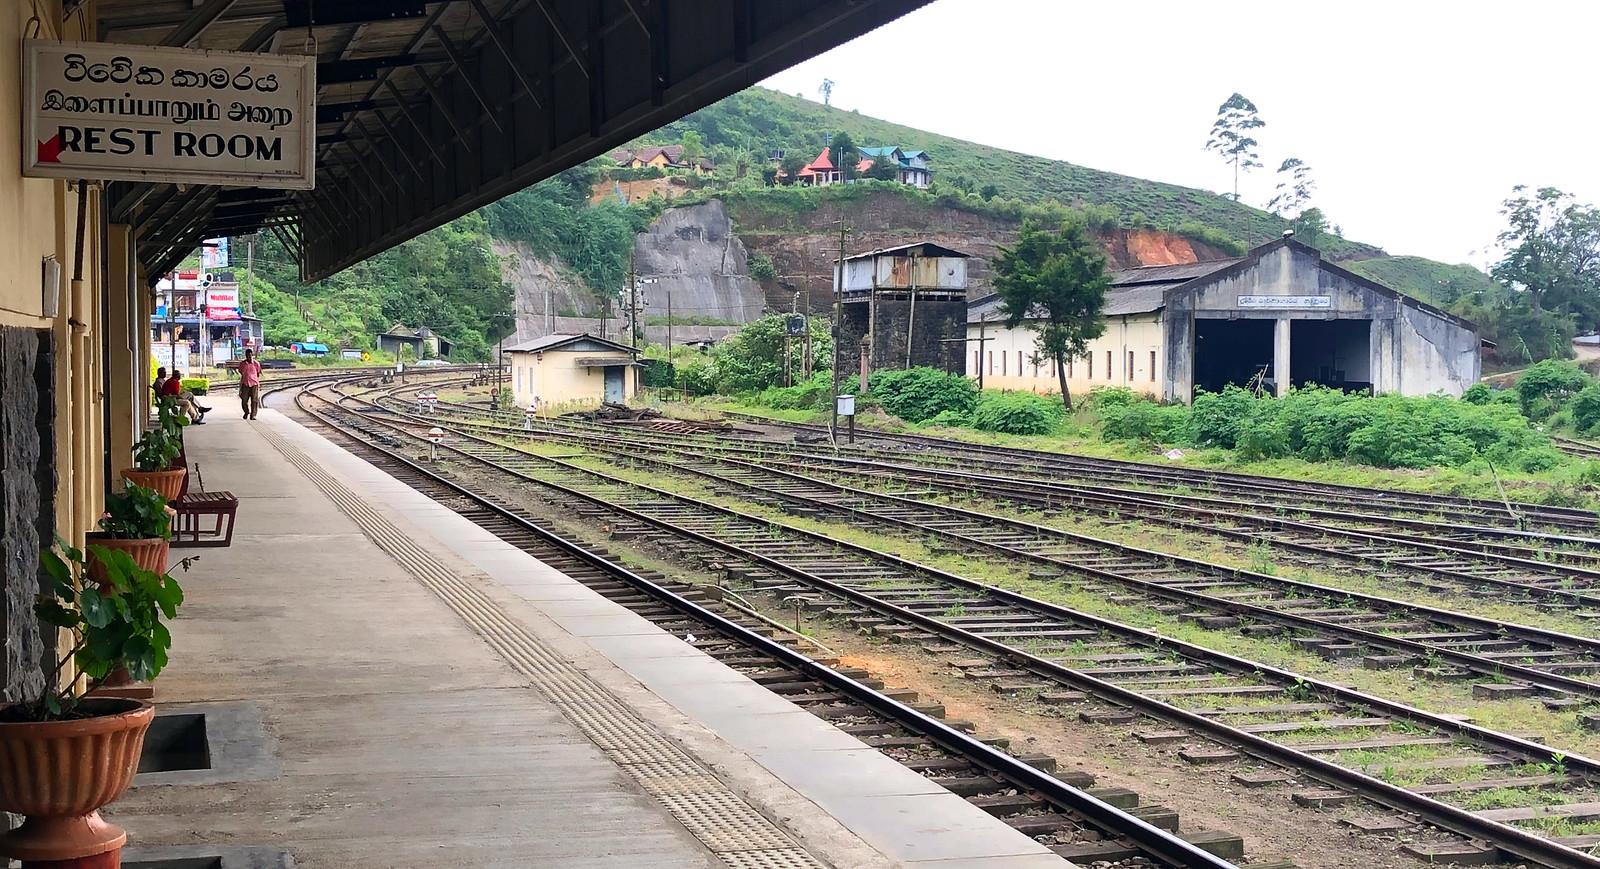 Tren de Ella, Ella Railway - Sri Lanka tren de ella - 33020666918 bd29c76ef9 h - Tren de Ella en Sri Lanka: ¿El viaje en tren más pintoresco del mundo?